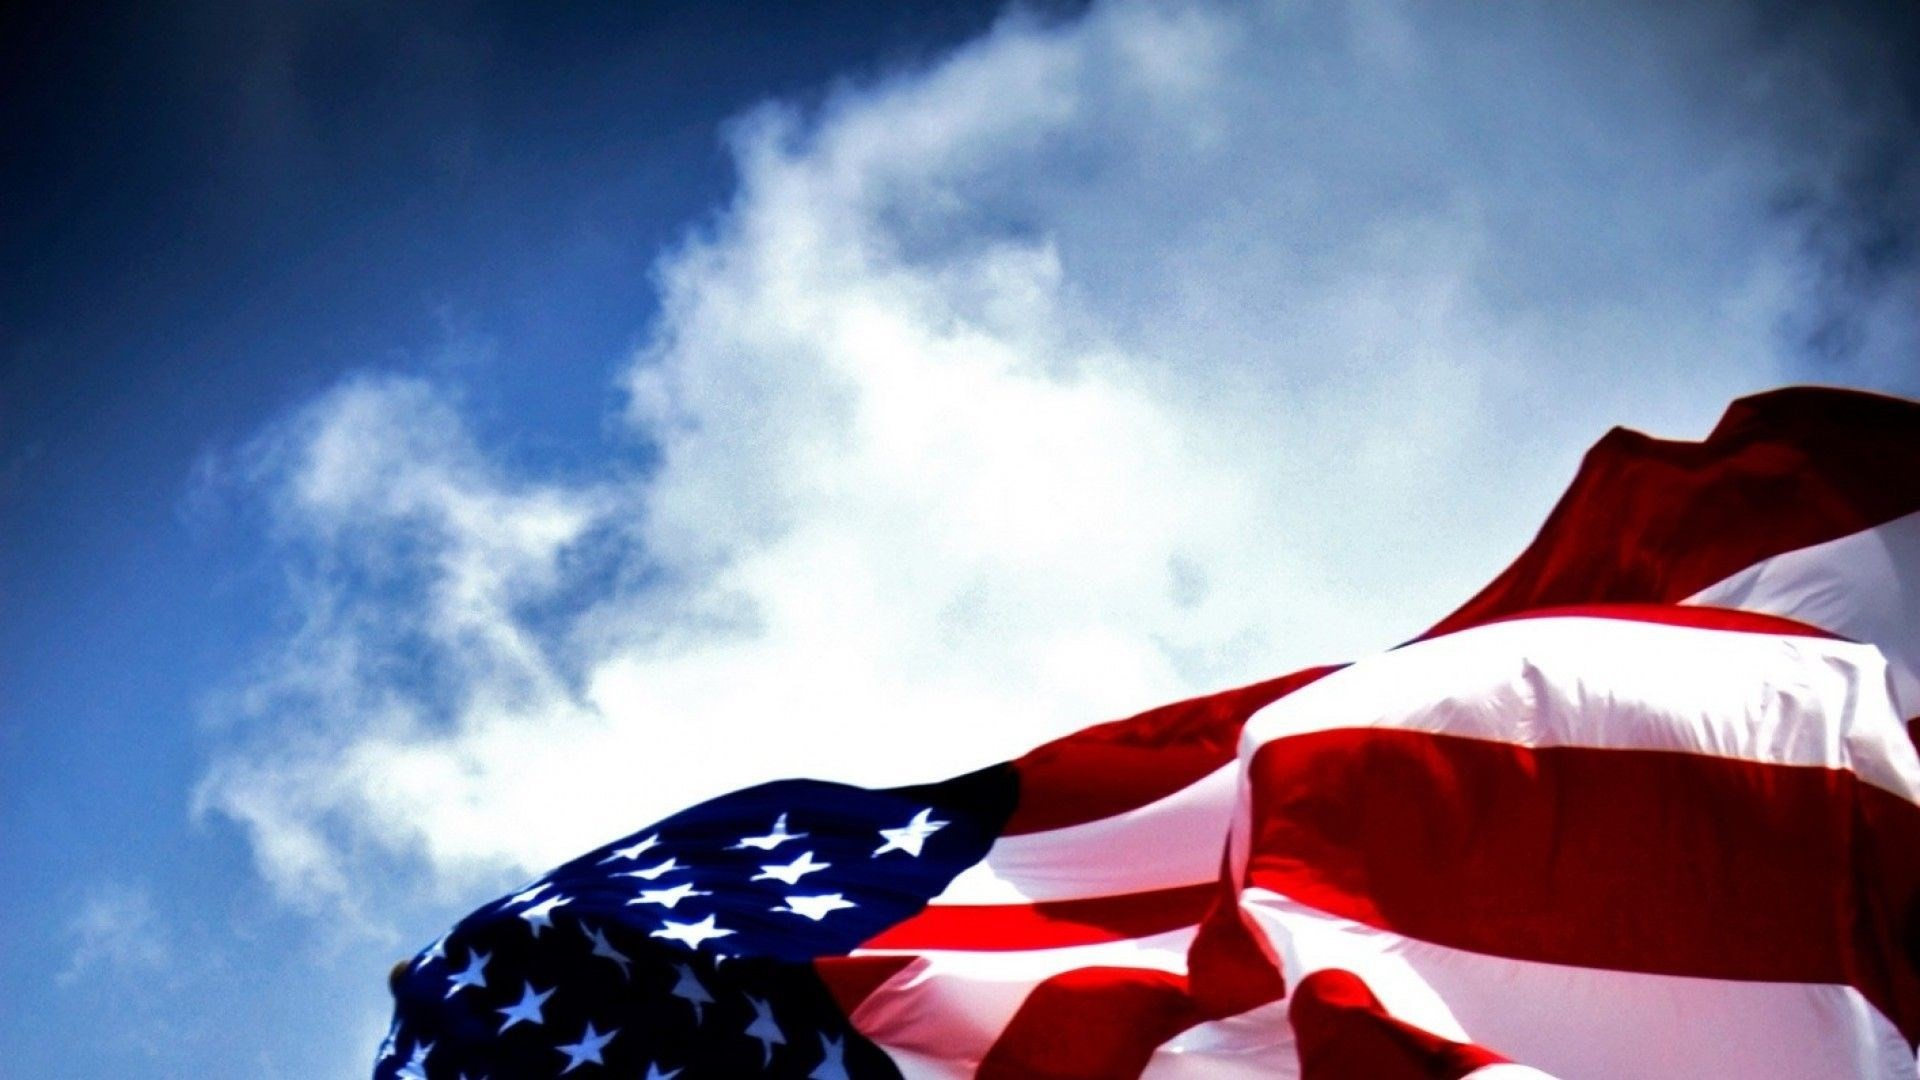 American Flag Wallpaper – HD Wallpapers 1080p | Wallpaper HD 1080p |  Pinterest | American flag wallpaper, Wallpaper and Usa flag wallpaper